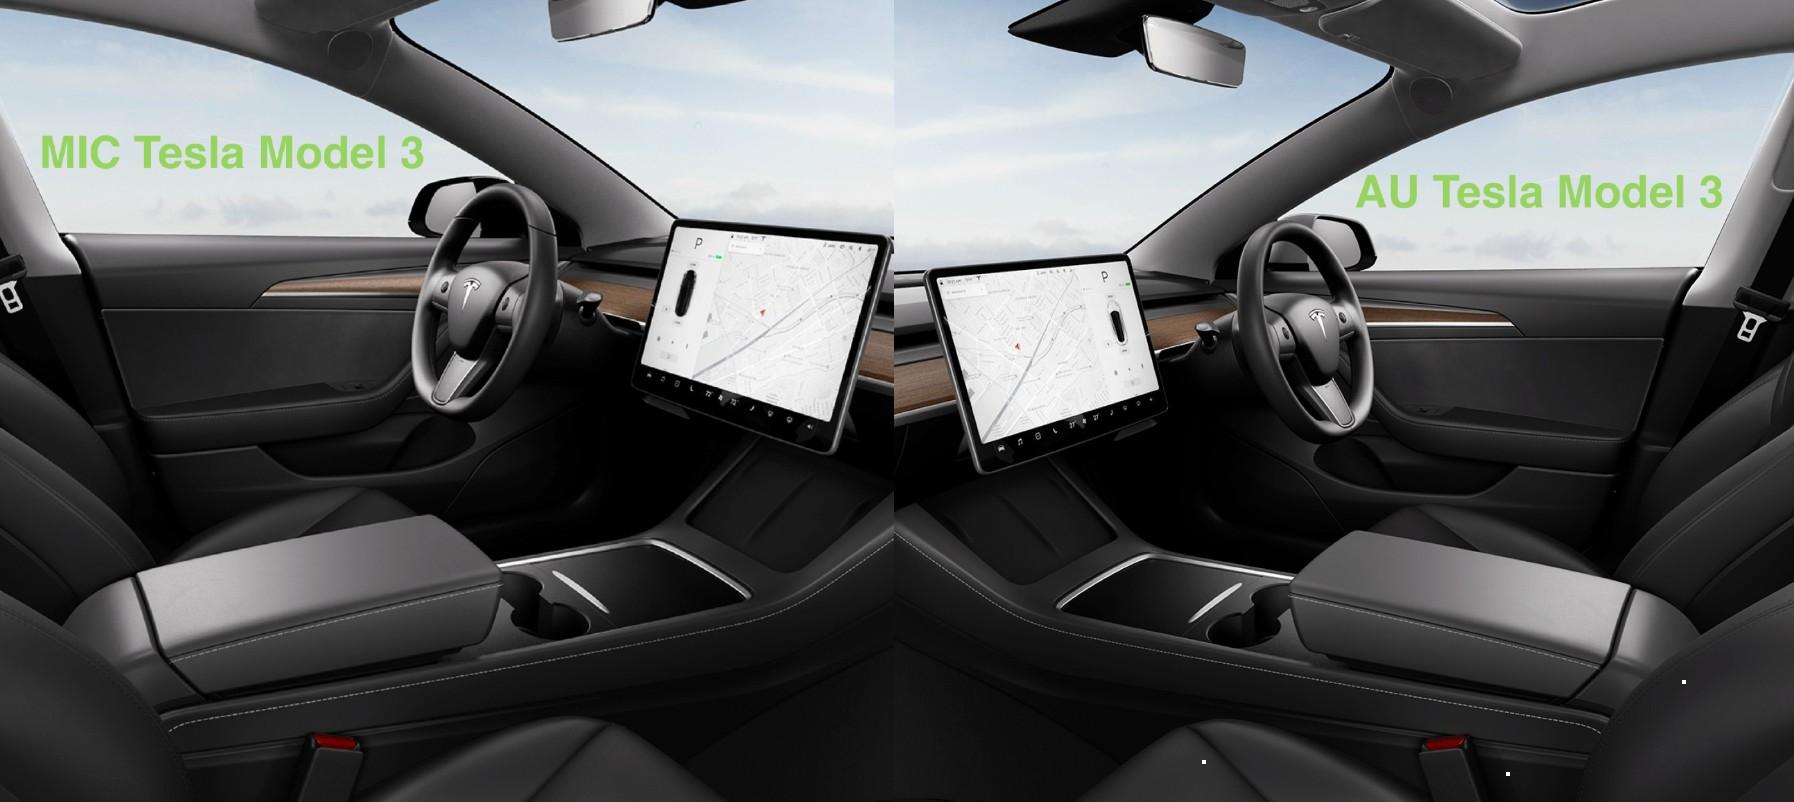 Tesla-China-Model-3-exports-AU-comparison